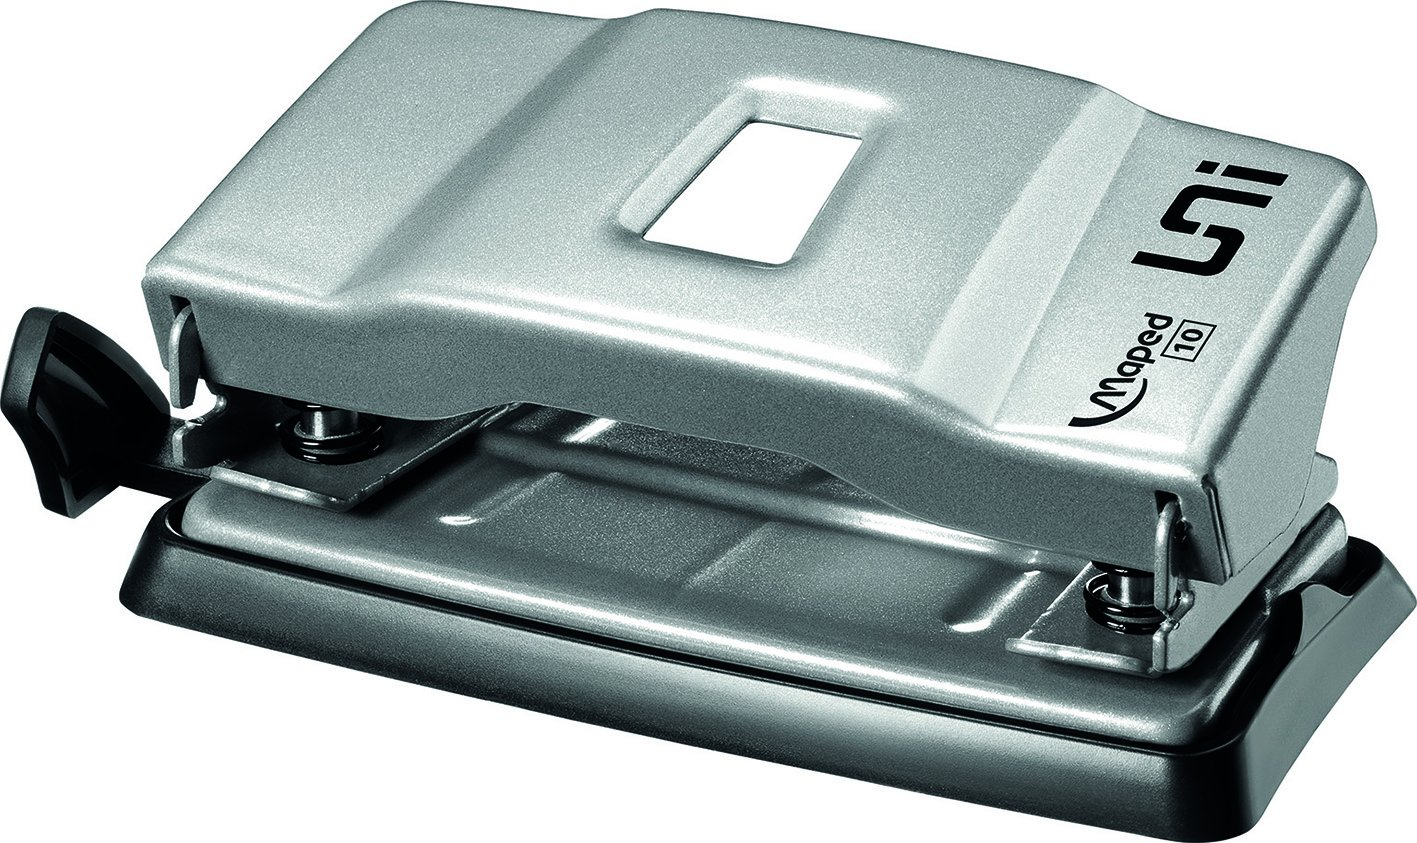 Cucitrice Pocket Metallo Universal Punto 10 Col Ass Blister WIGO